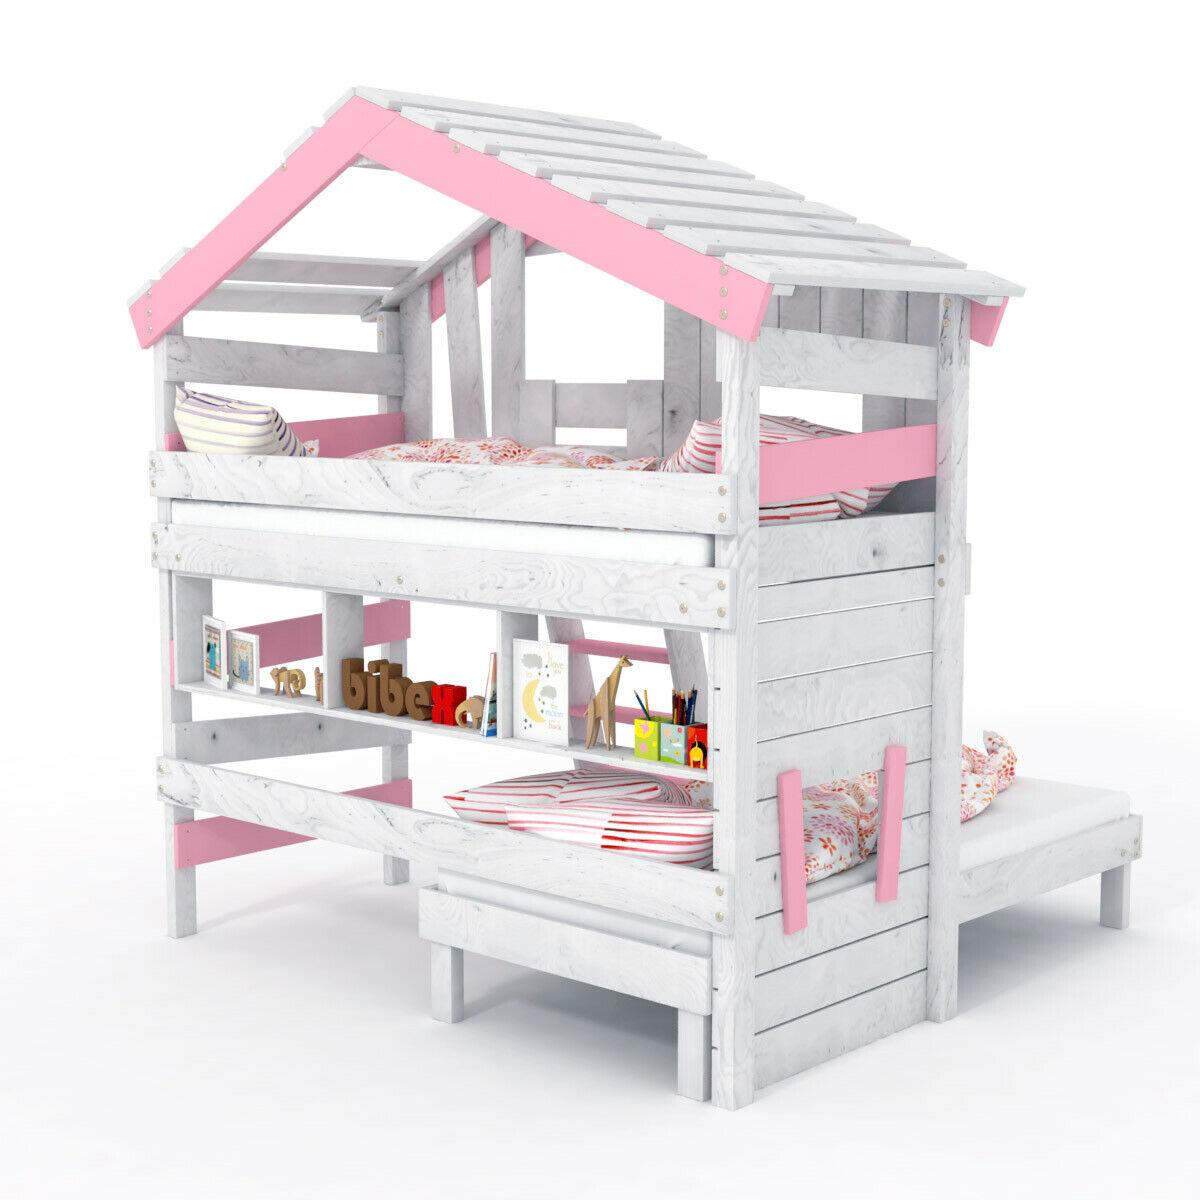 Full Size of Mädchenbetten Bibealpin Chalet Kinderbett Wohnzimmer Mädchenbetten